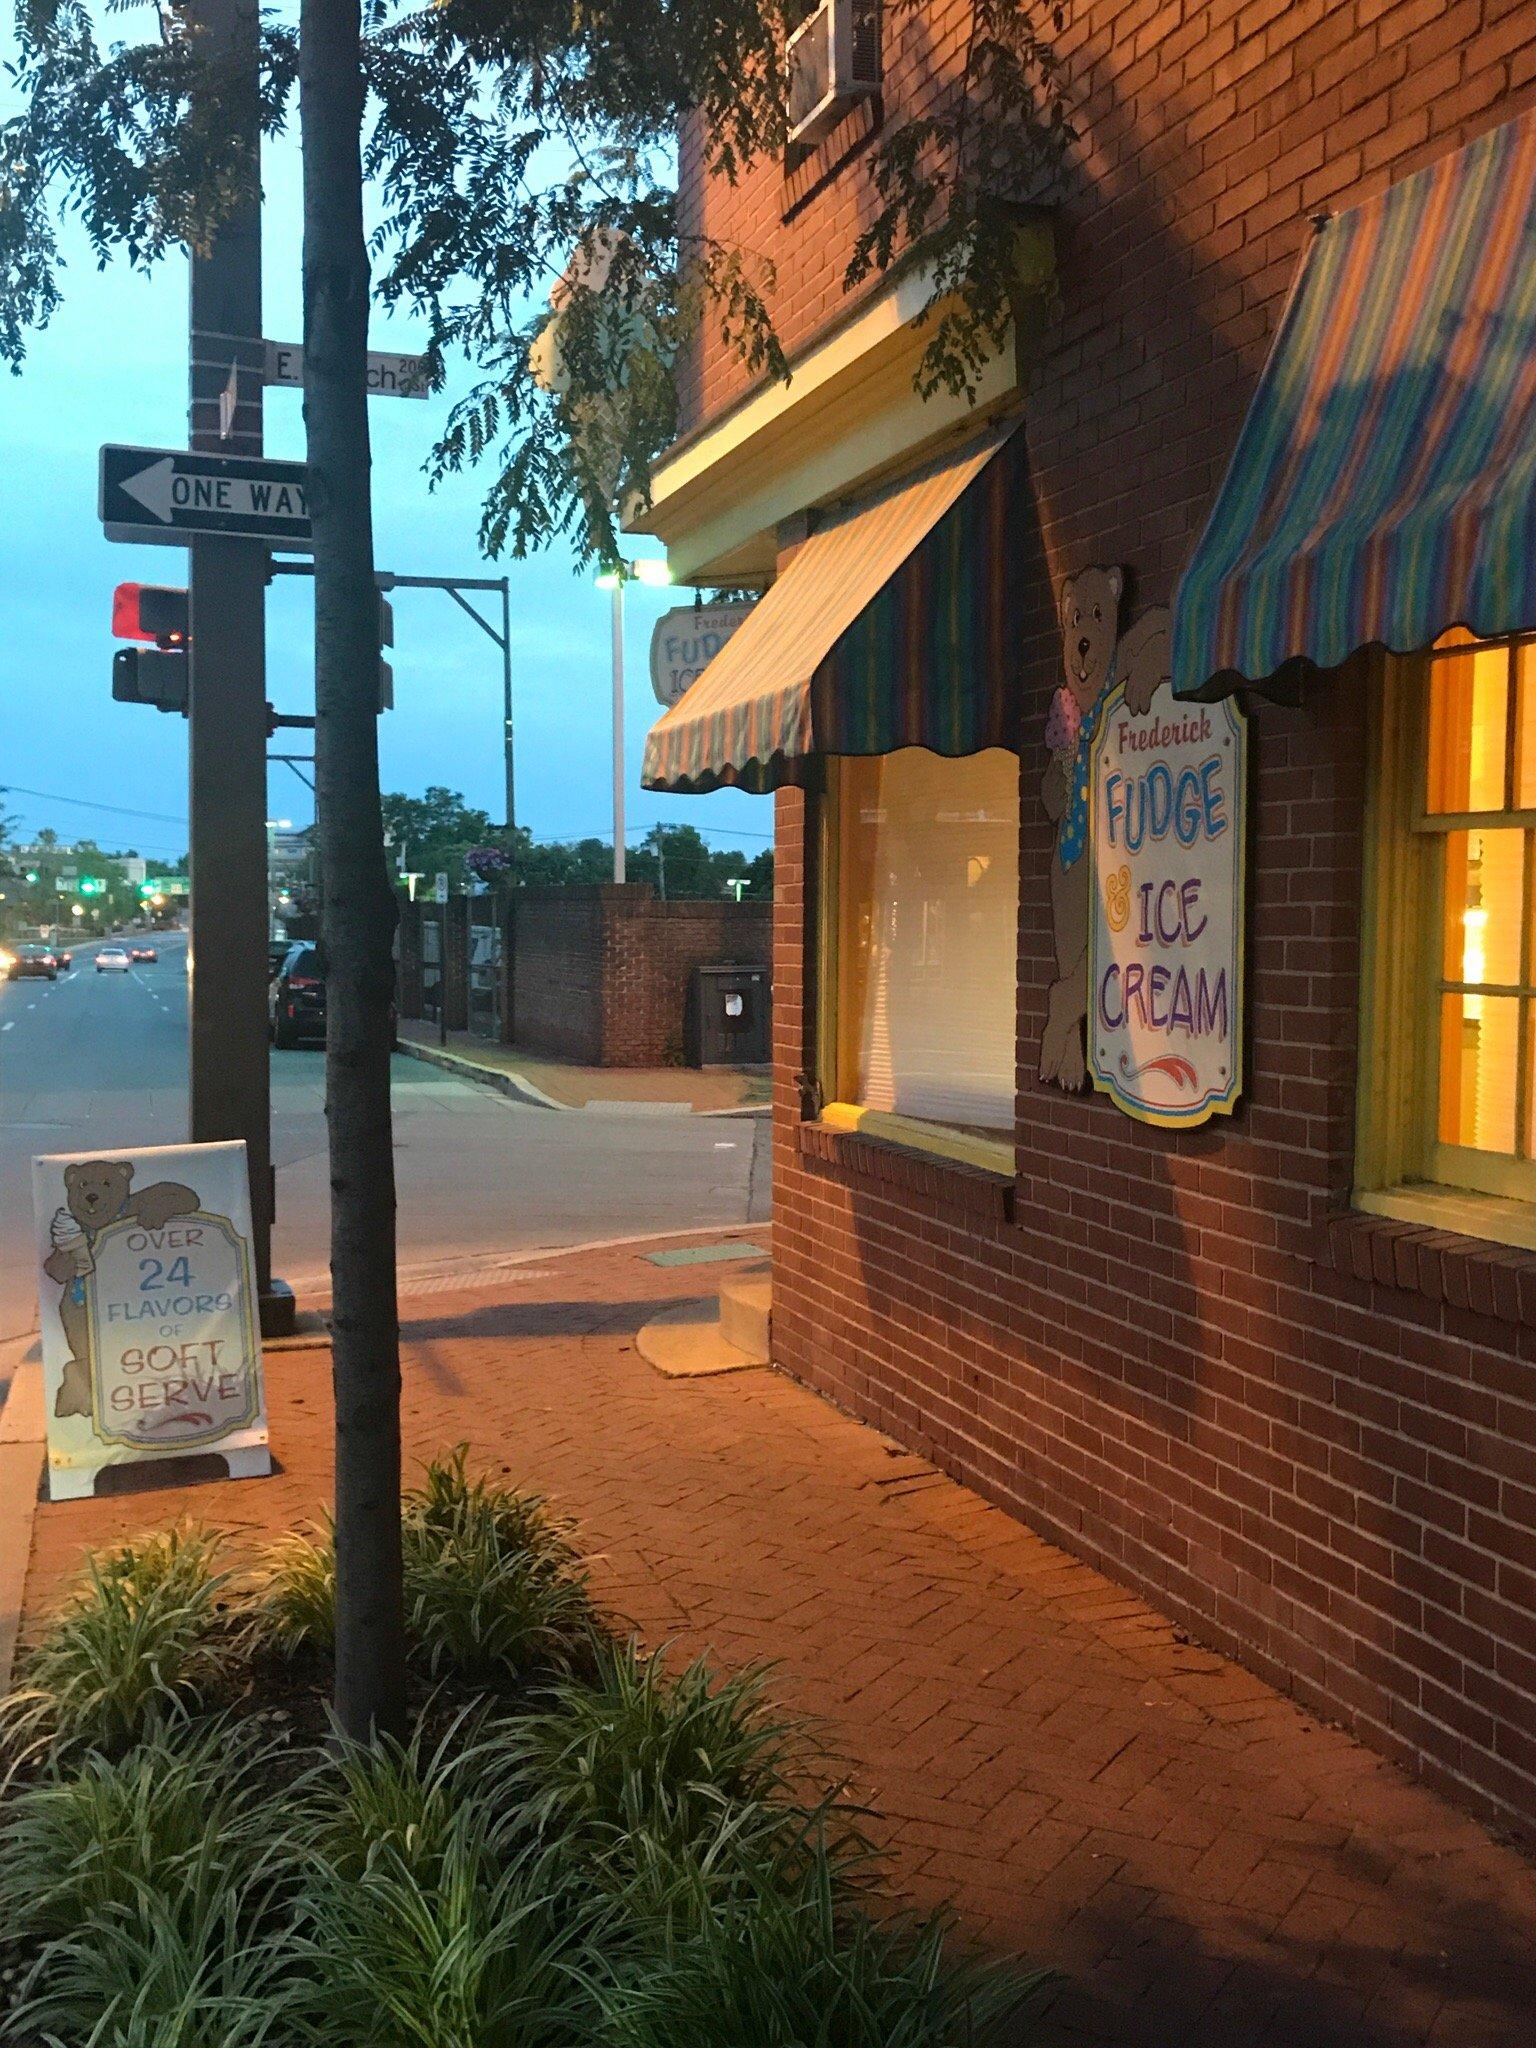 frederick fudge ice cream co restaurant reviews phone number